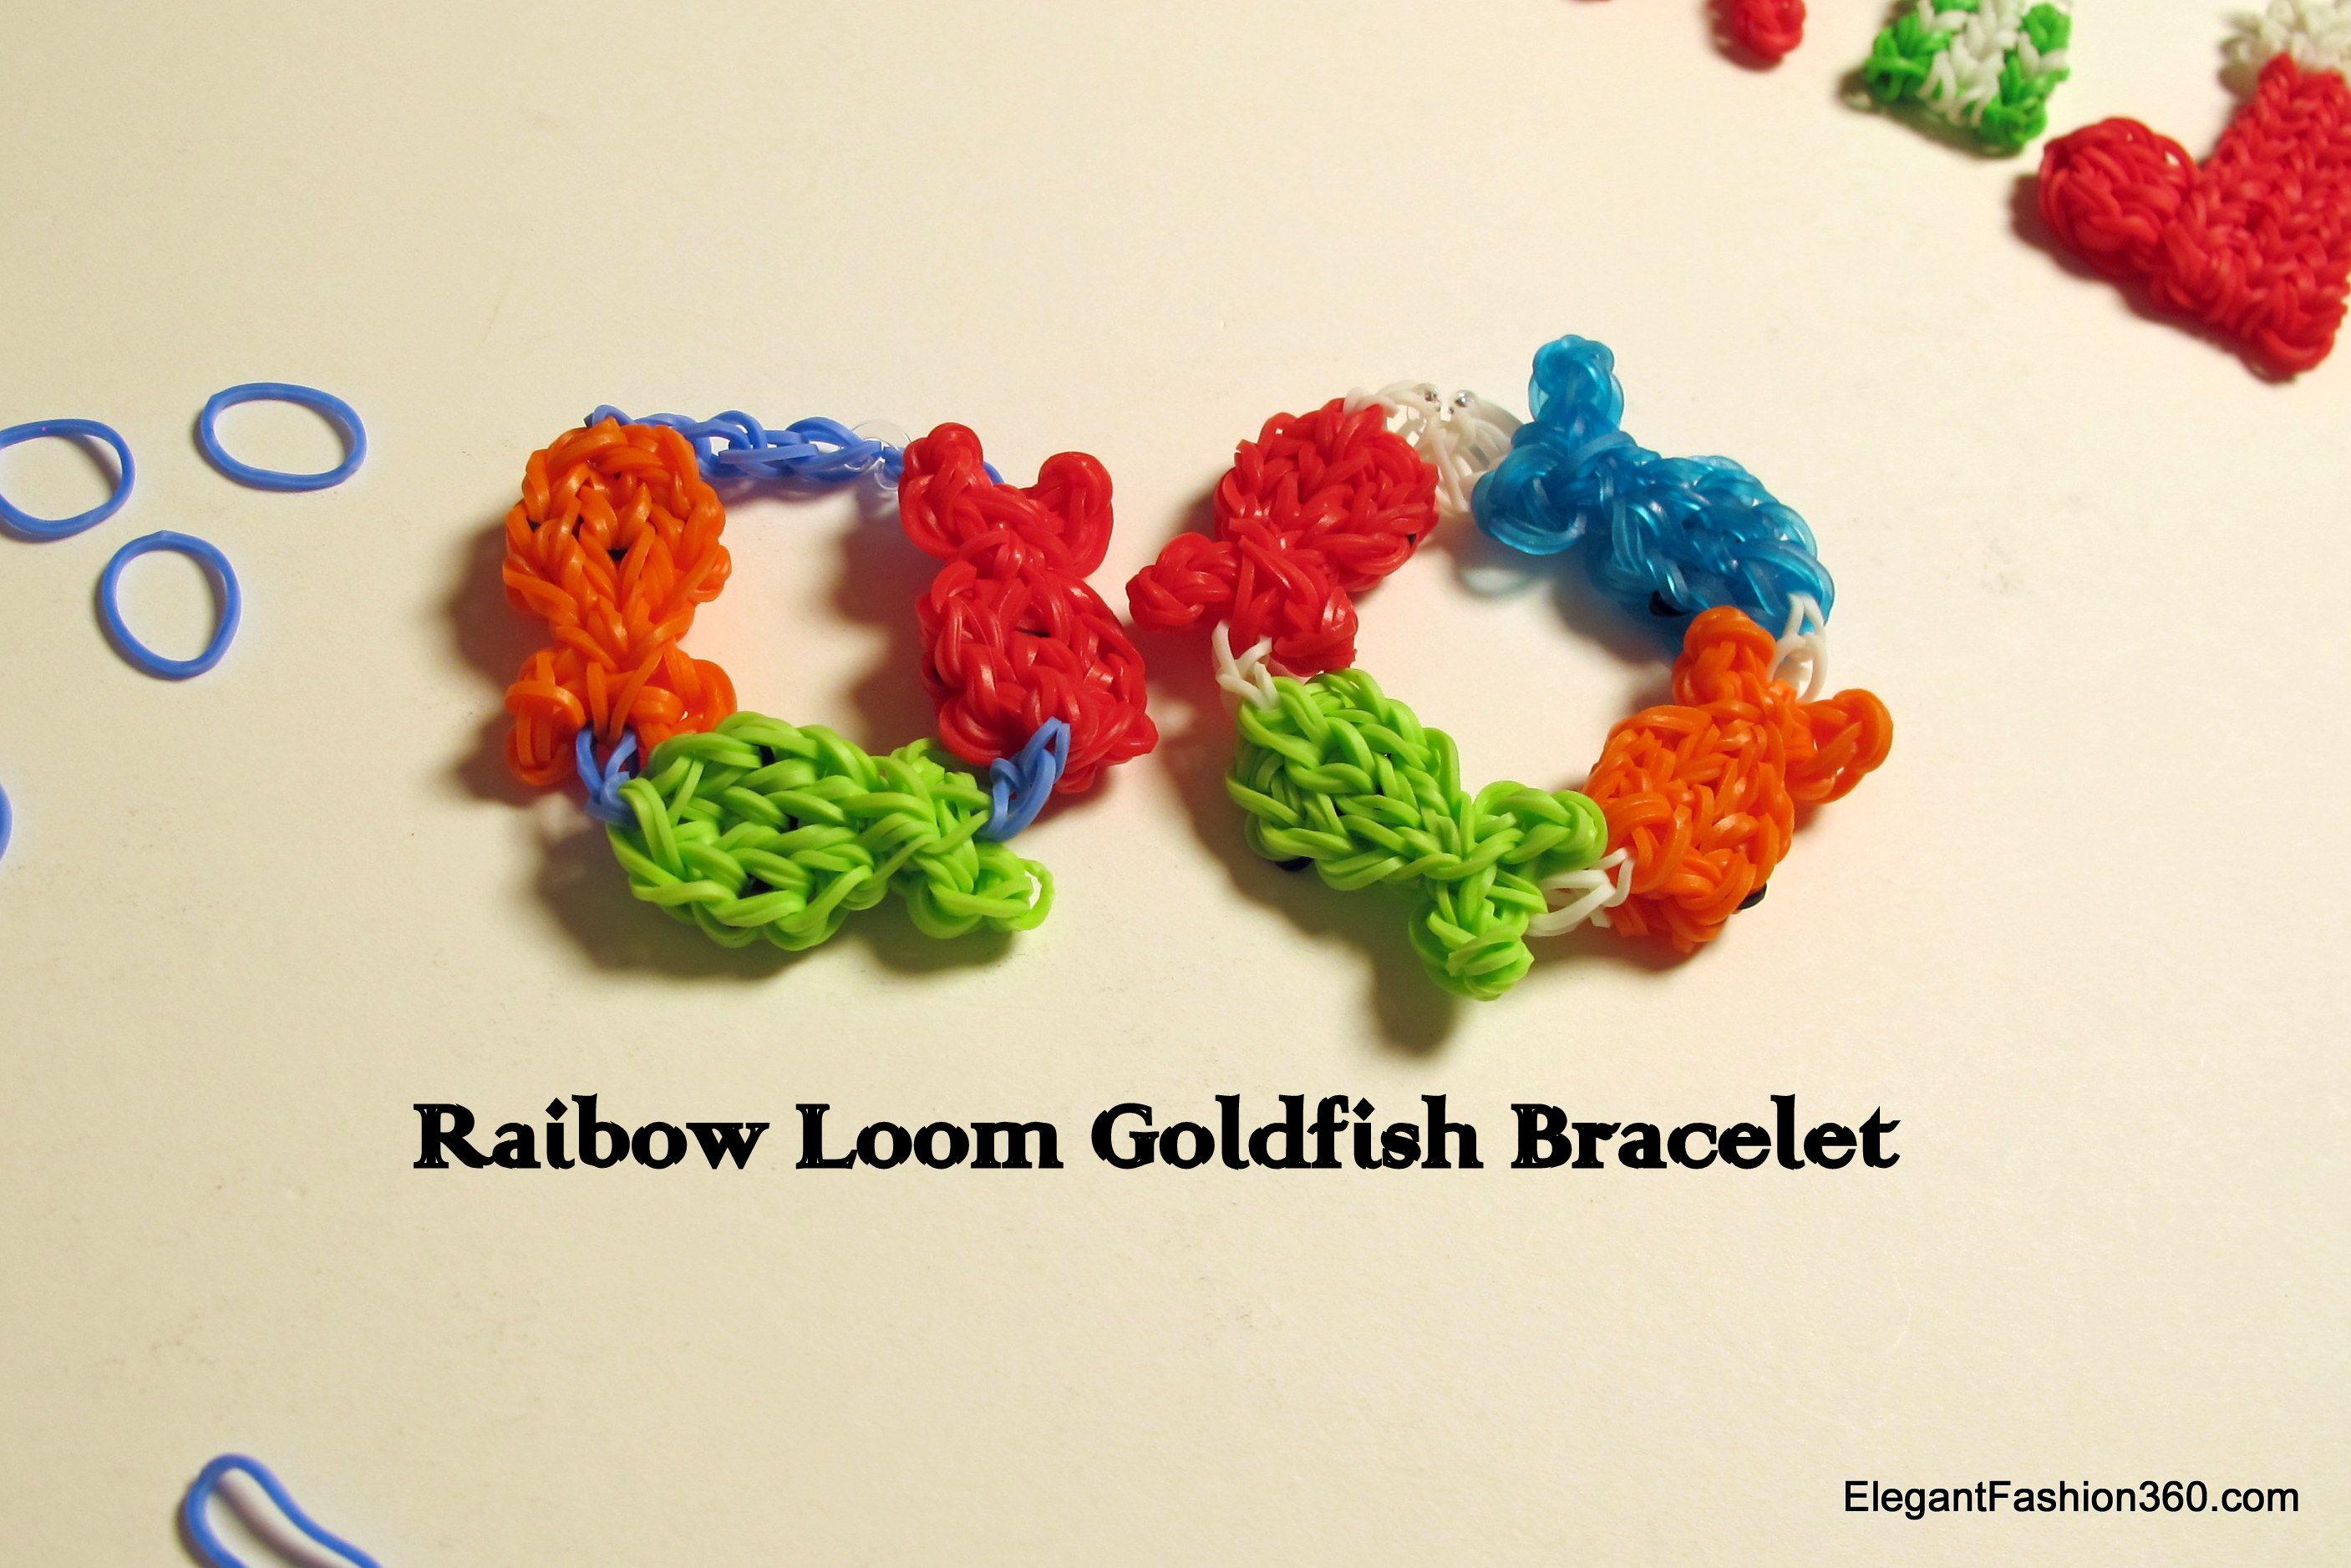 How to make goldfish bracelet or key-chain.  http://elegantfashion360.com/make-goldfish-charms-rainbow-loom/ ♥ Like us on Facebook: http://on.fb.me/1bz2WYi ♥ Tutorials on yourTube channel: https://www.youtube.com/user/ElegantFashion360   ♥ Check out my web site: http://elegantfashion360.com Creativity is an Attitude!!! Good Luck!